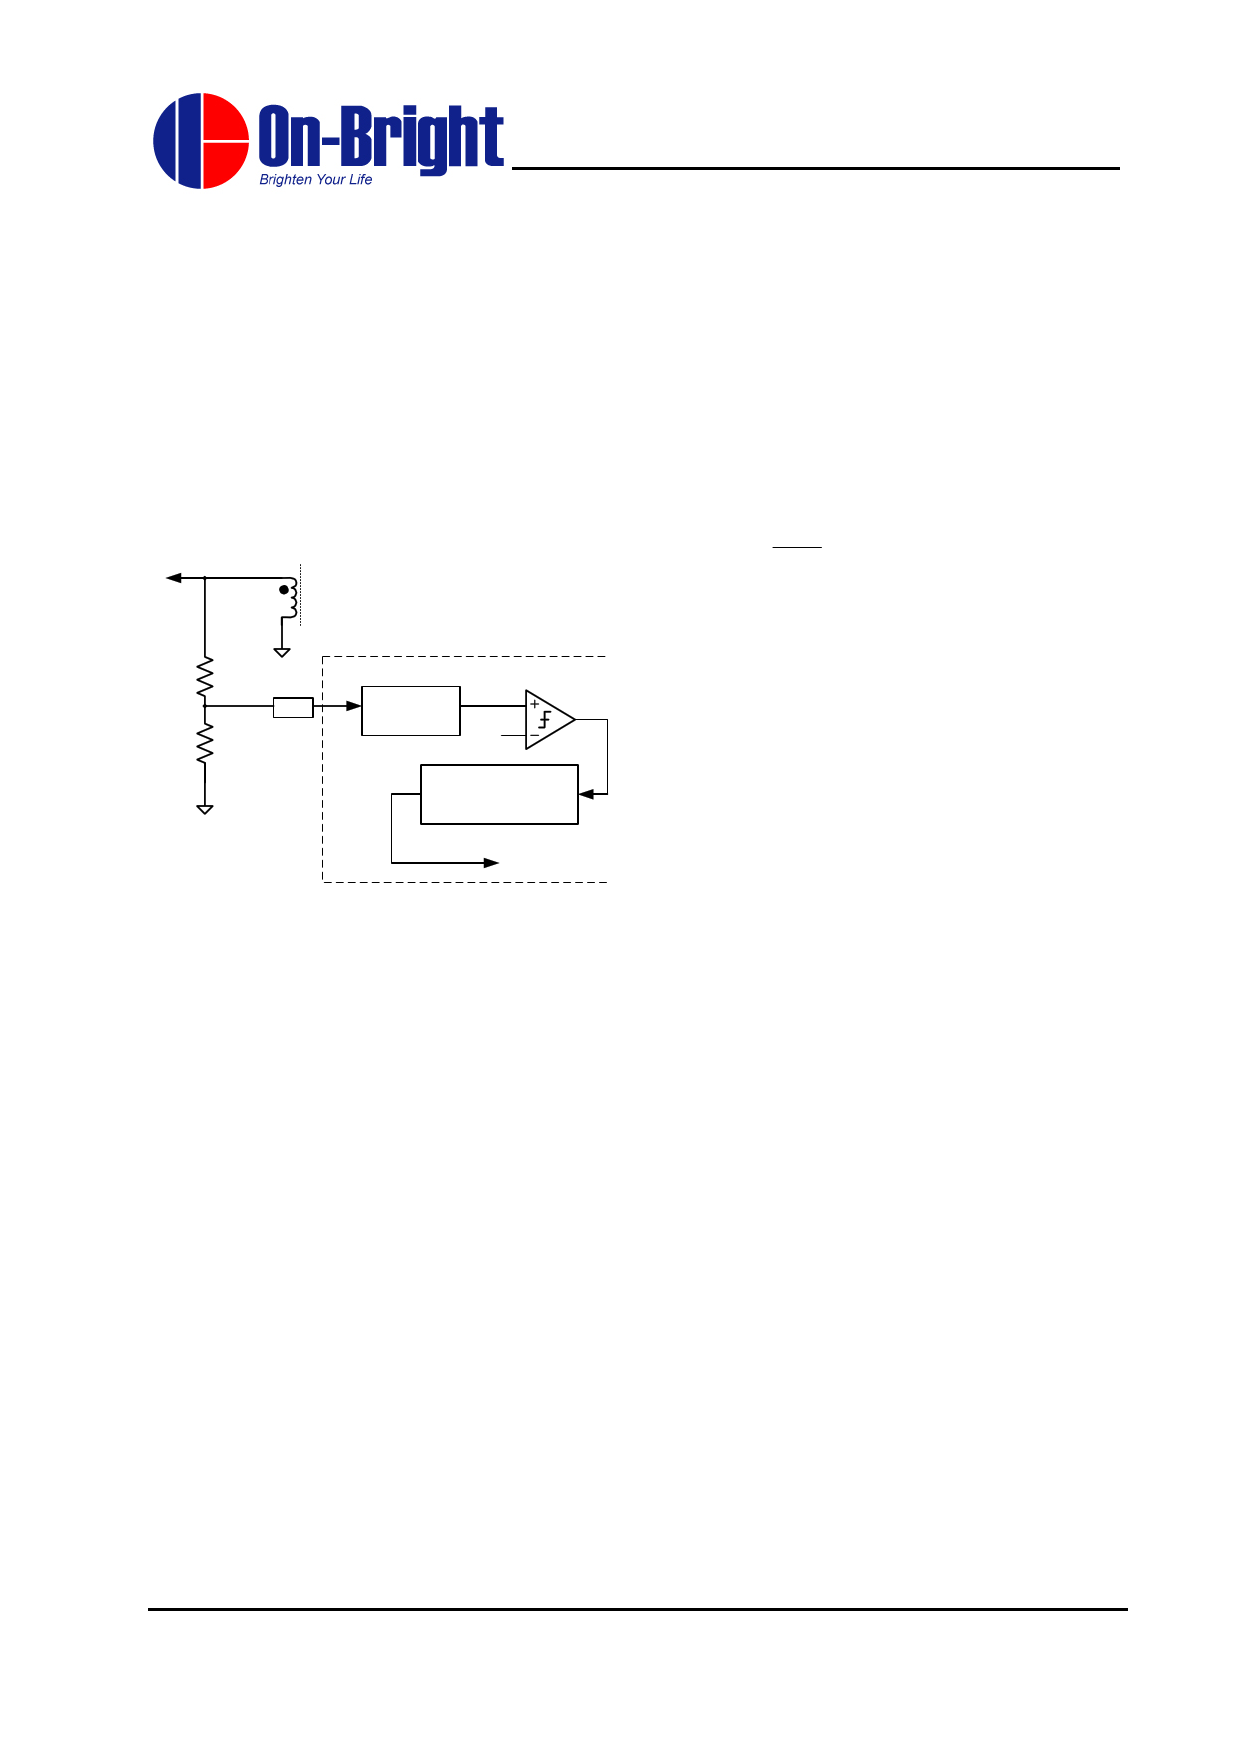 OB2201 arduino